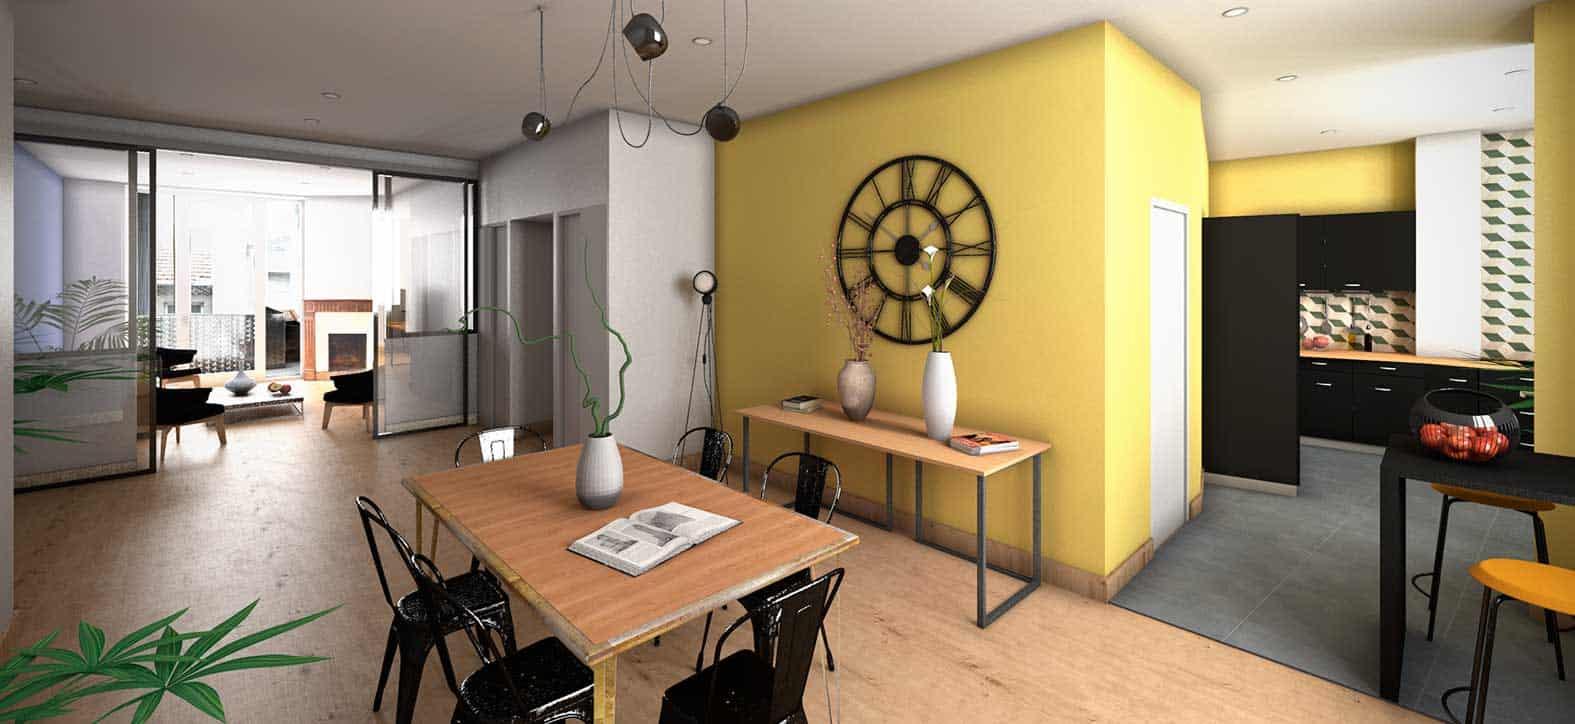 Rénovation salon rehabilitation exemple